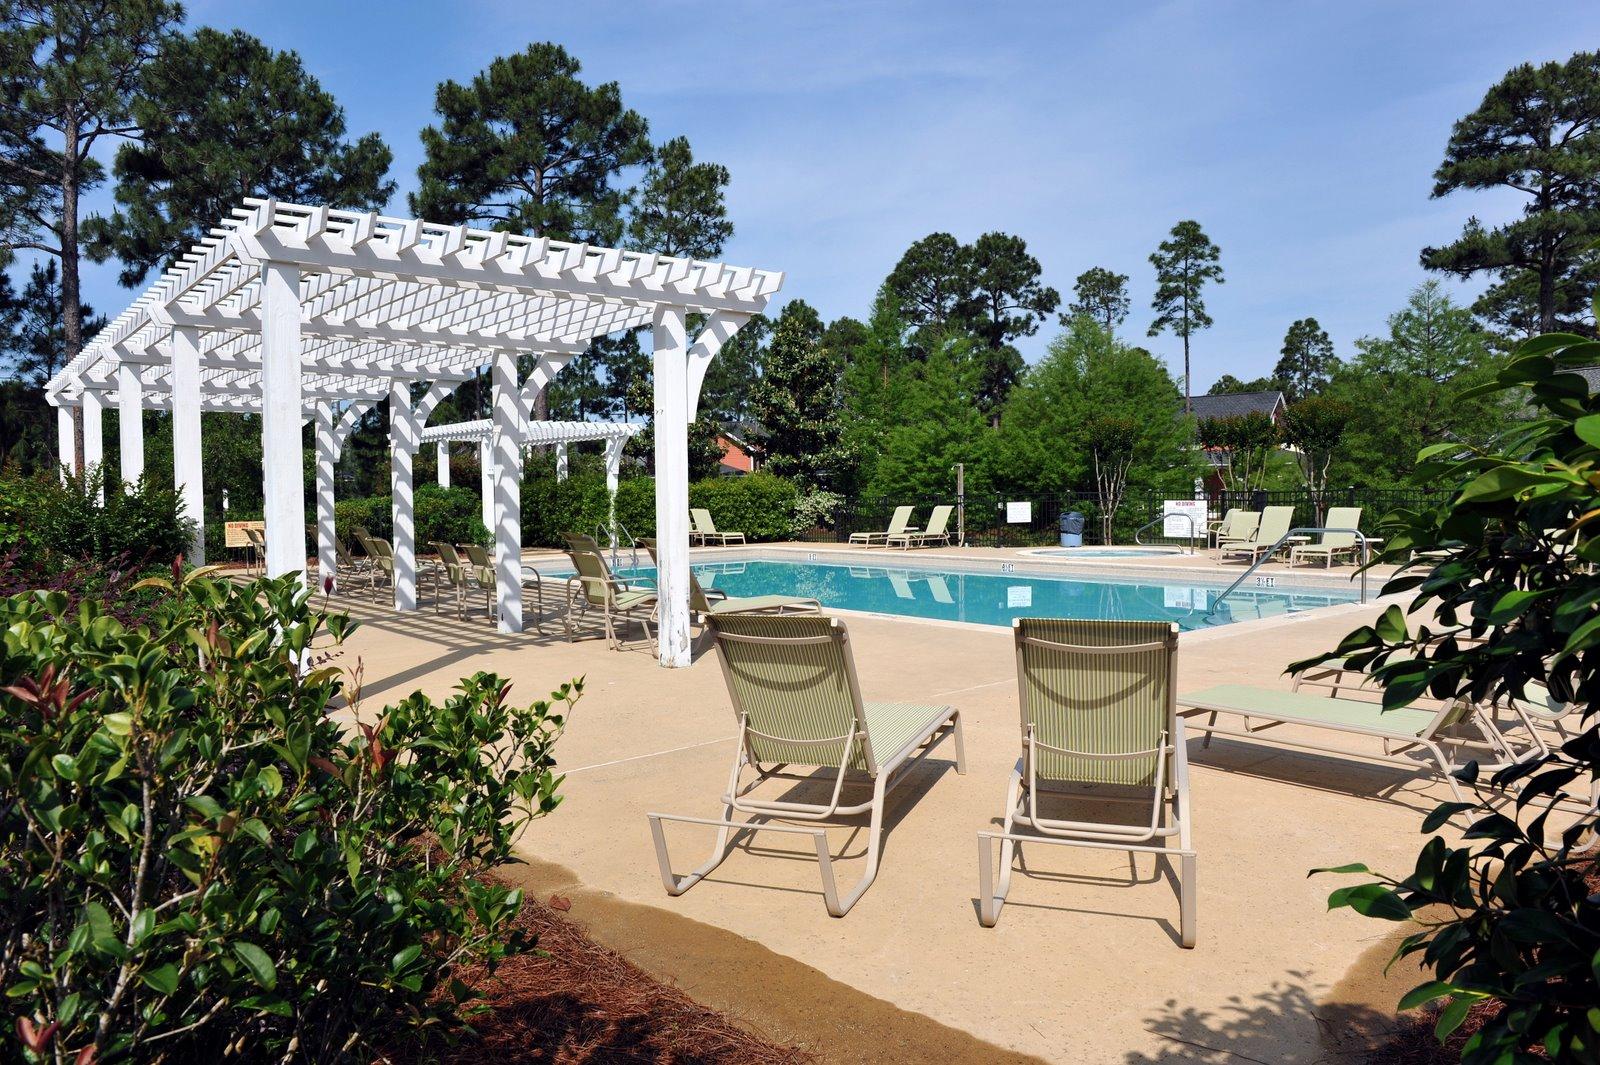 1280 Laurel Grove Condo rental in Sandestin Rentals ~ Cottages and Villas  in Destin Florida - #24